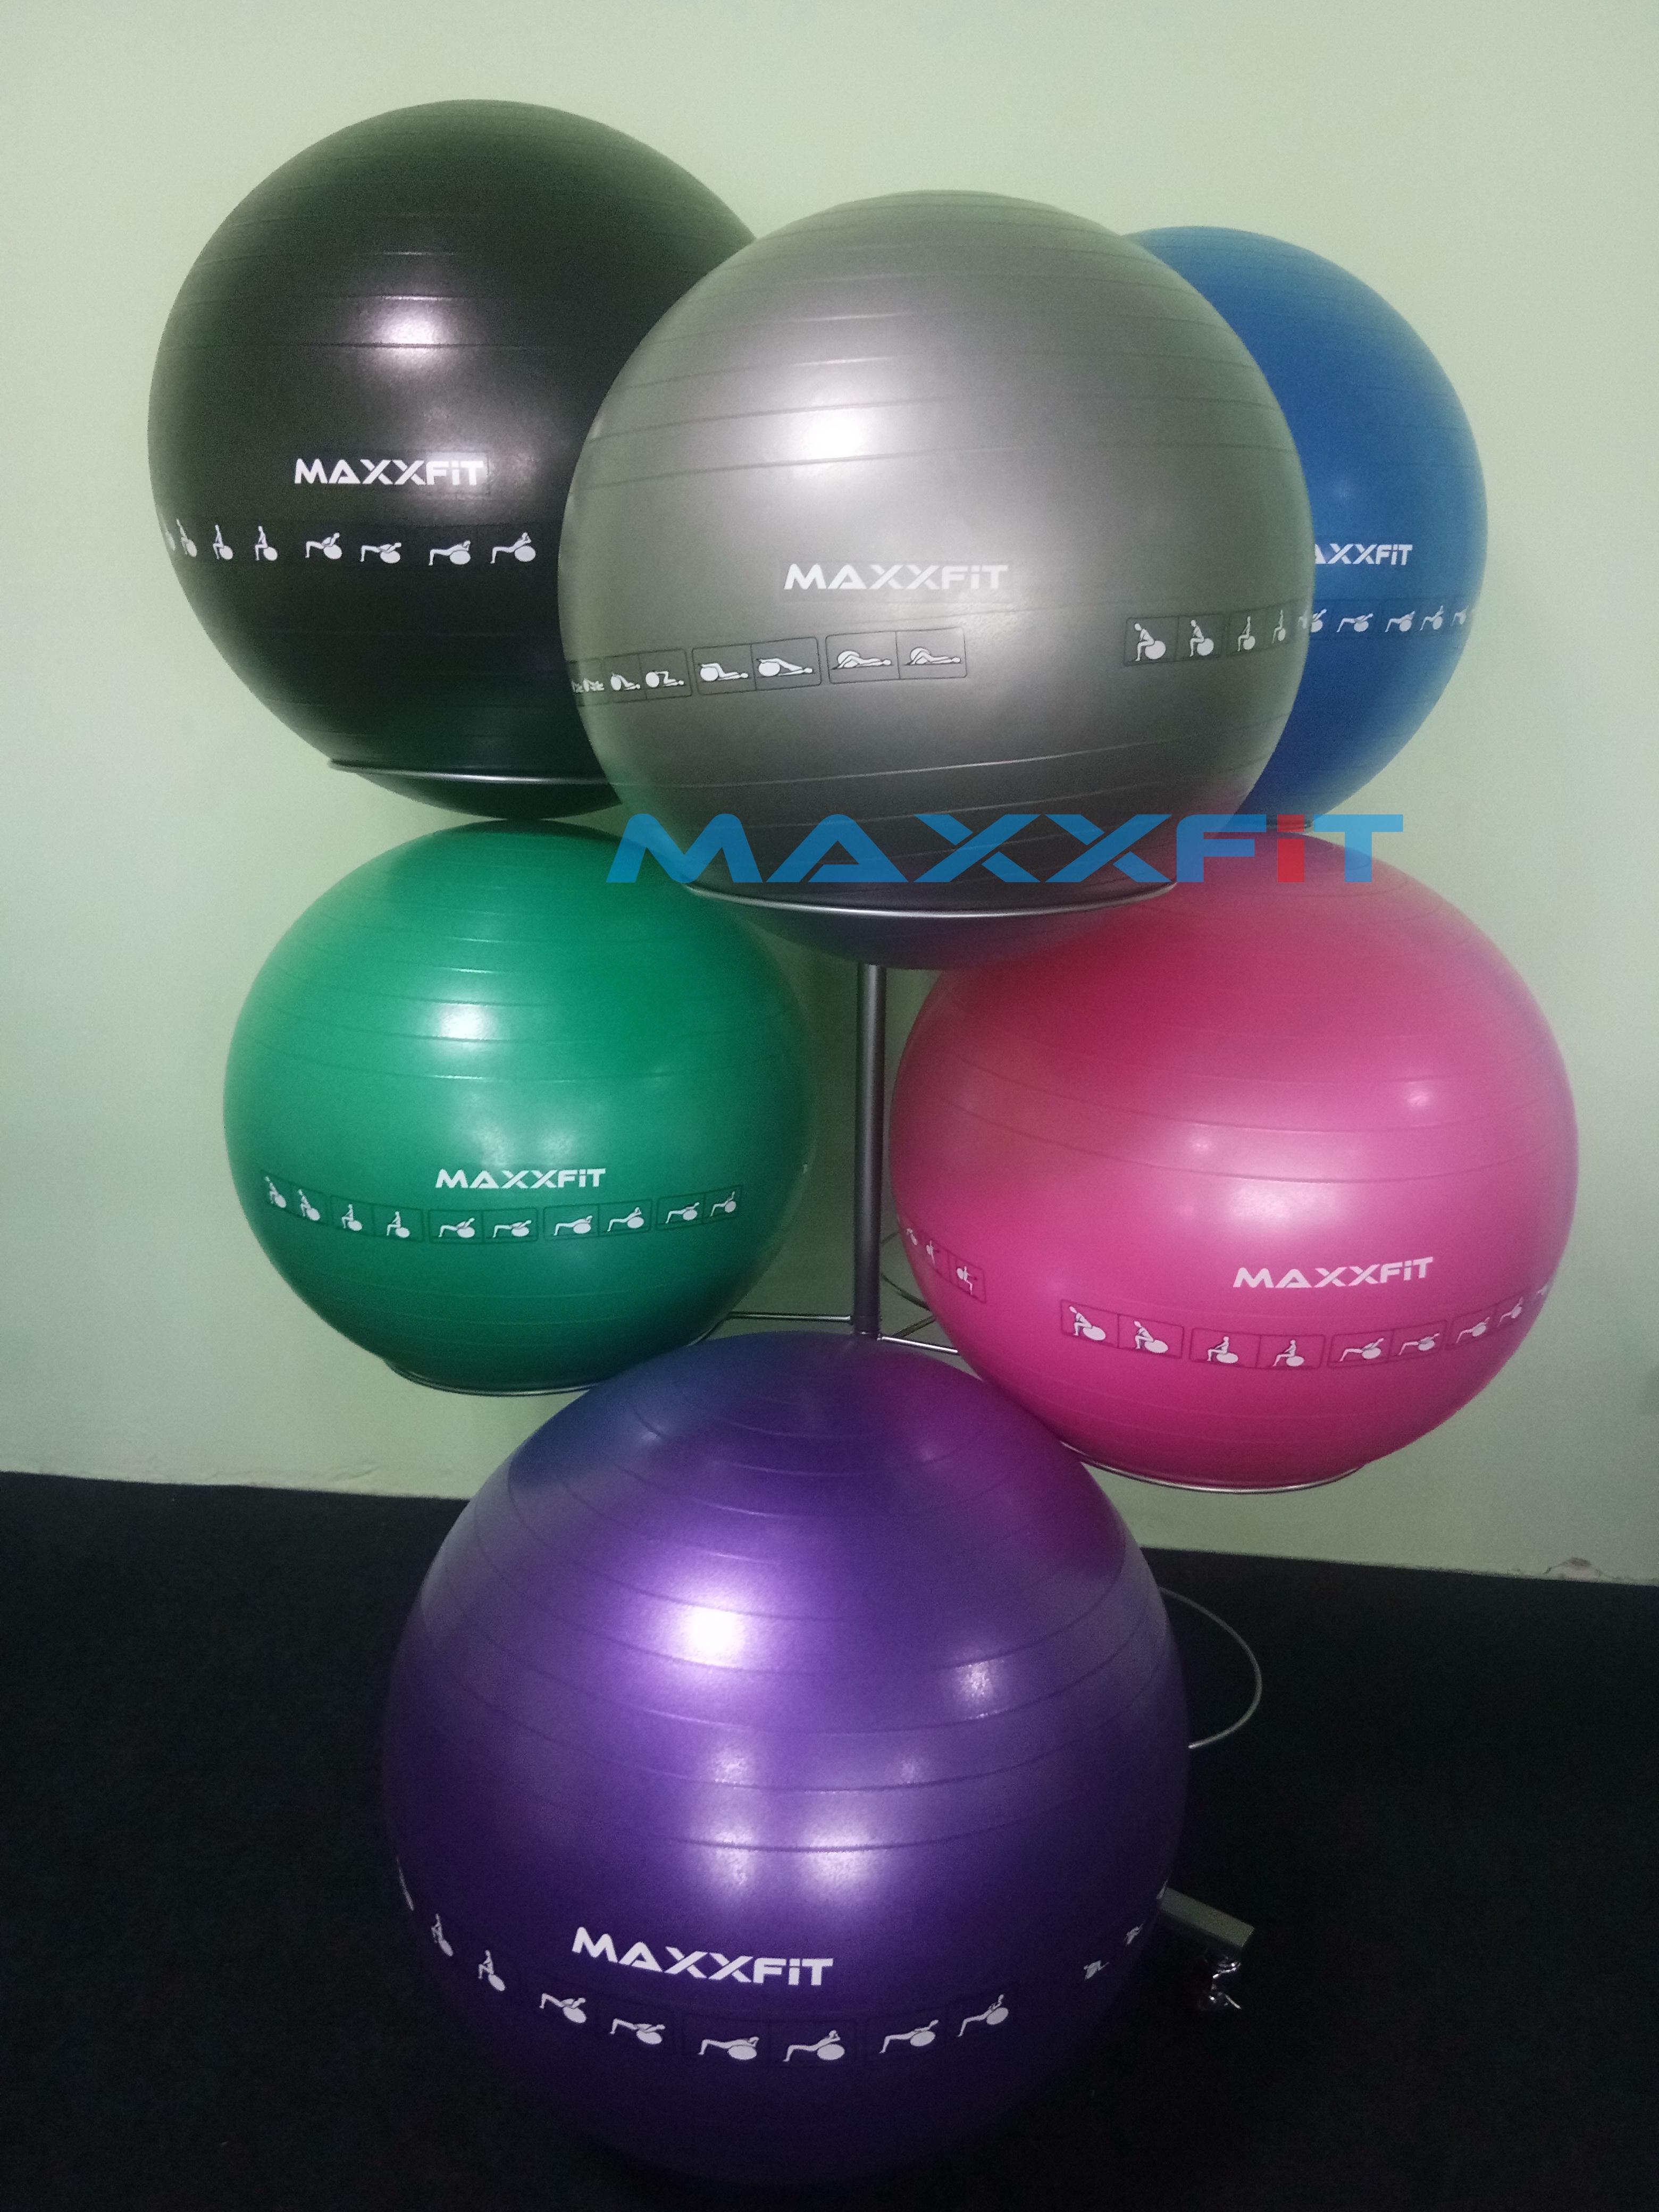 MAXXFiT ANTI-BURST GYM BALL FITBALL With Pump